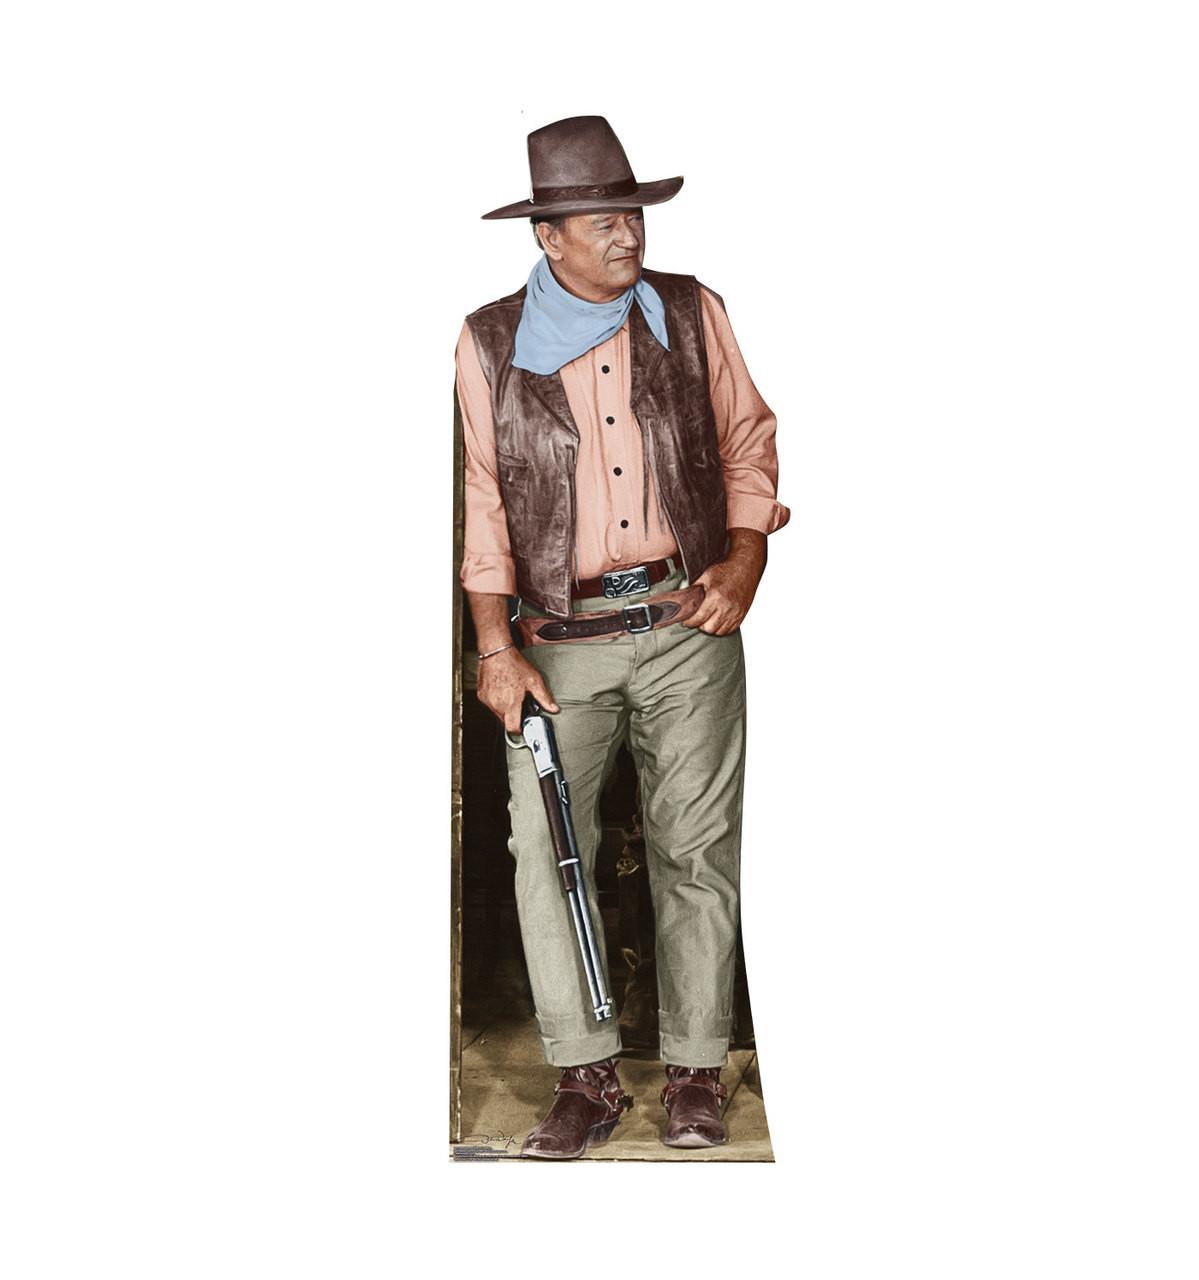 Life-size John Wayne - Collector's Edition Cardboard Standup 3